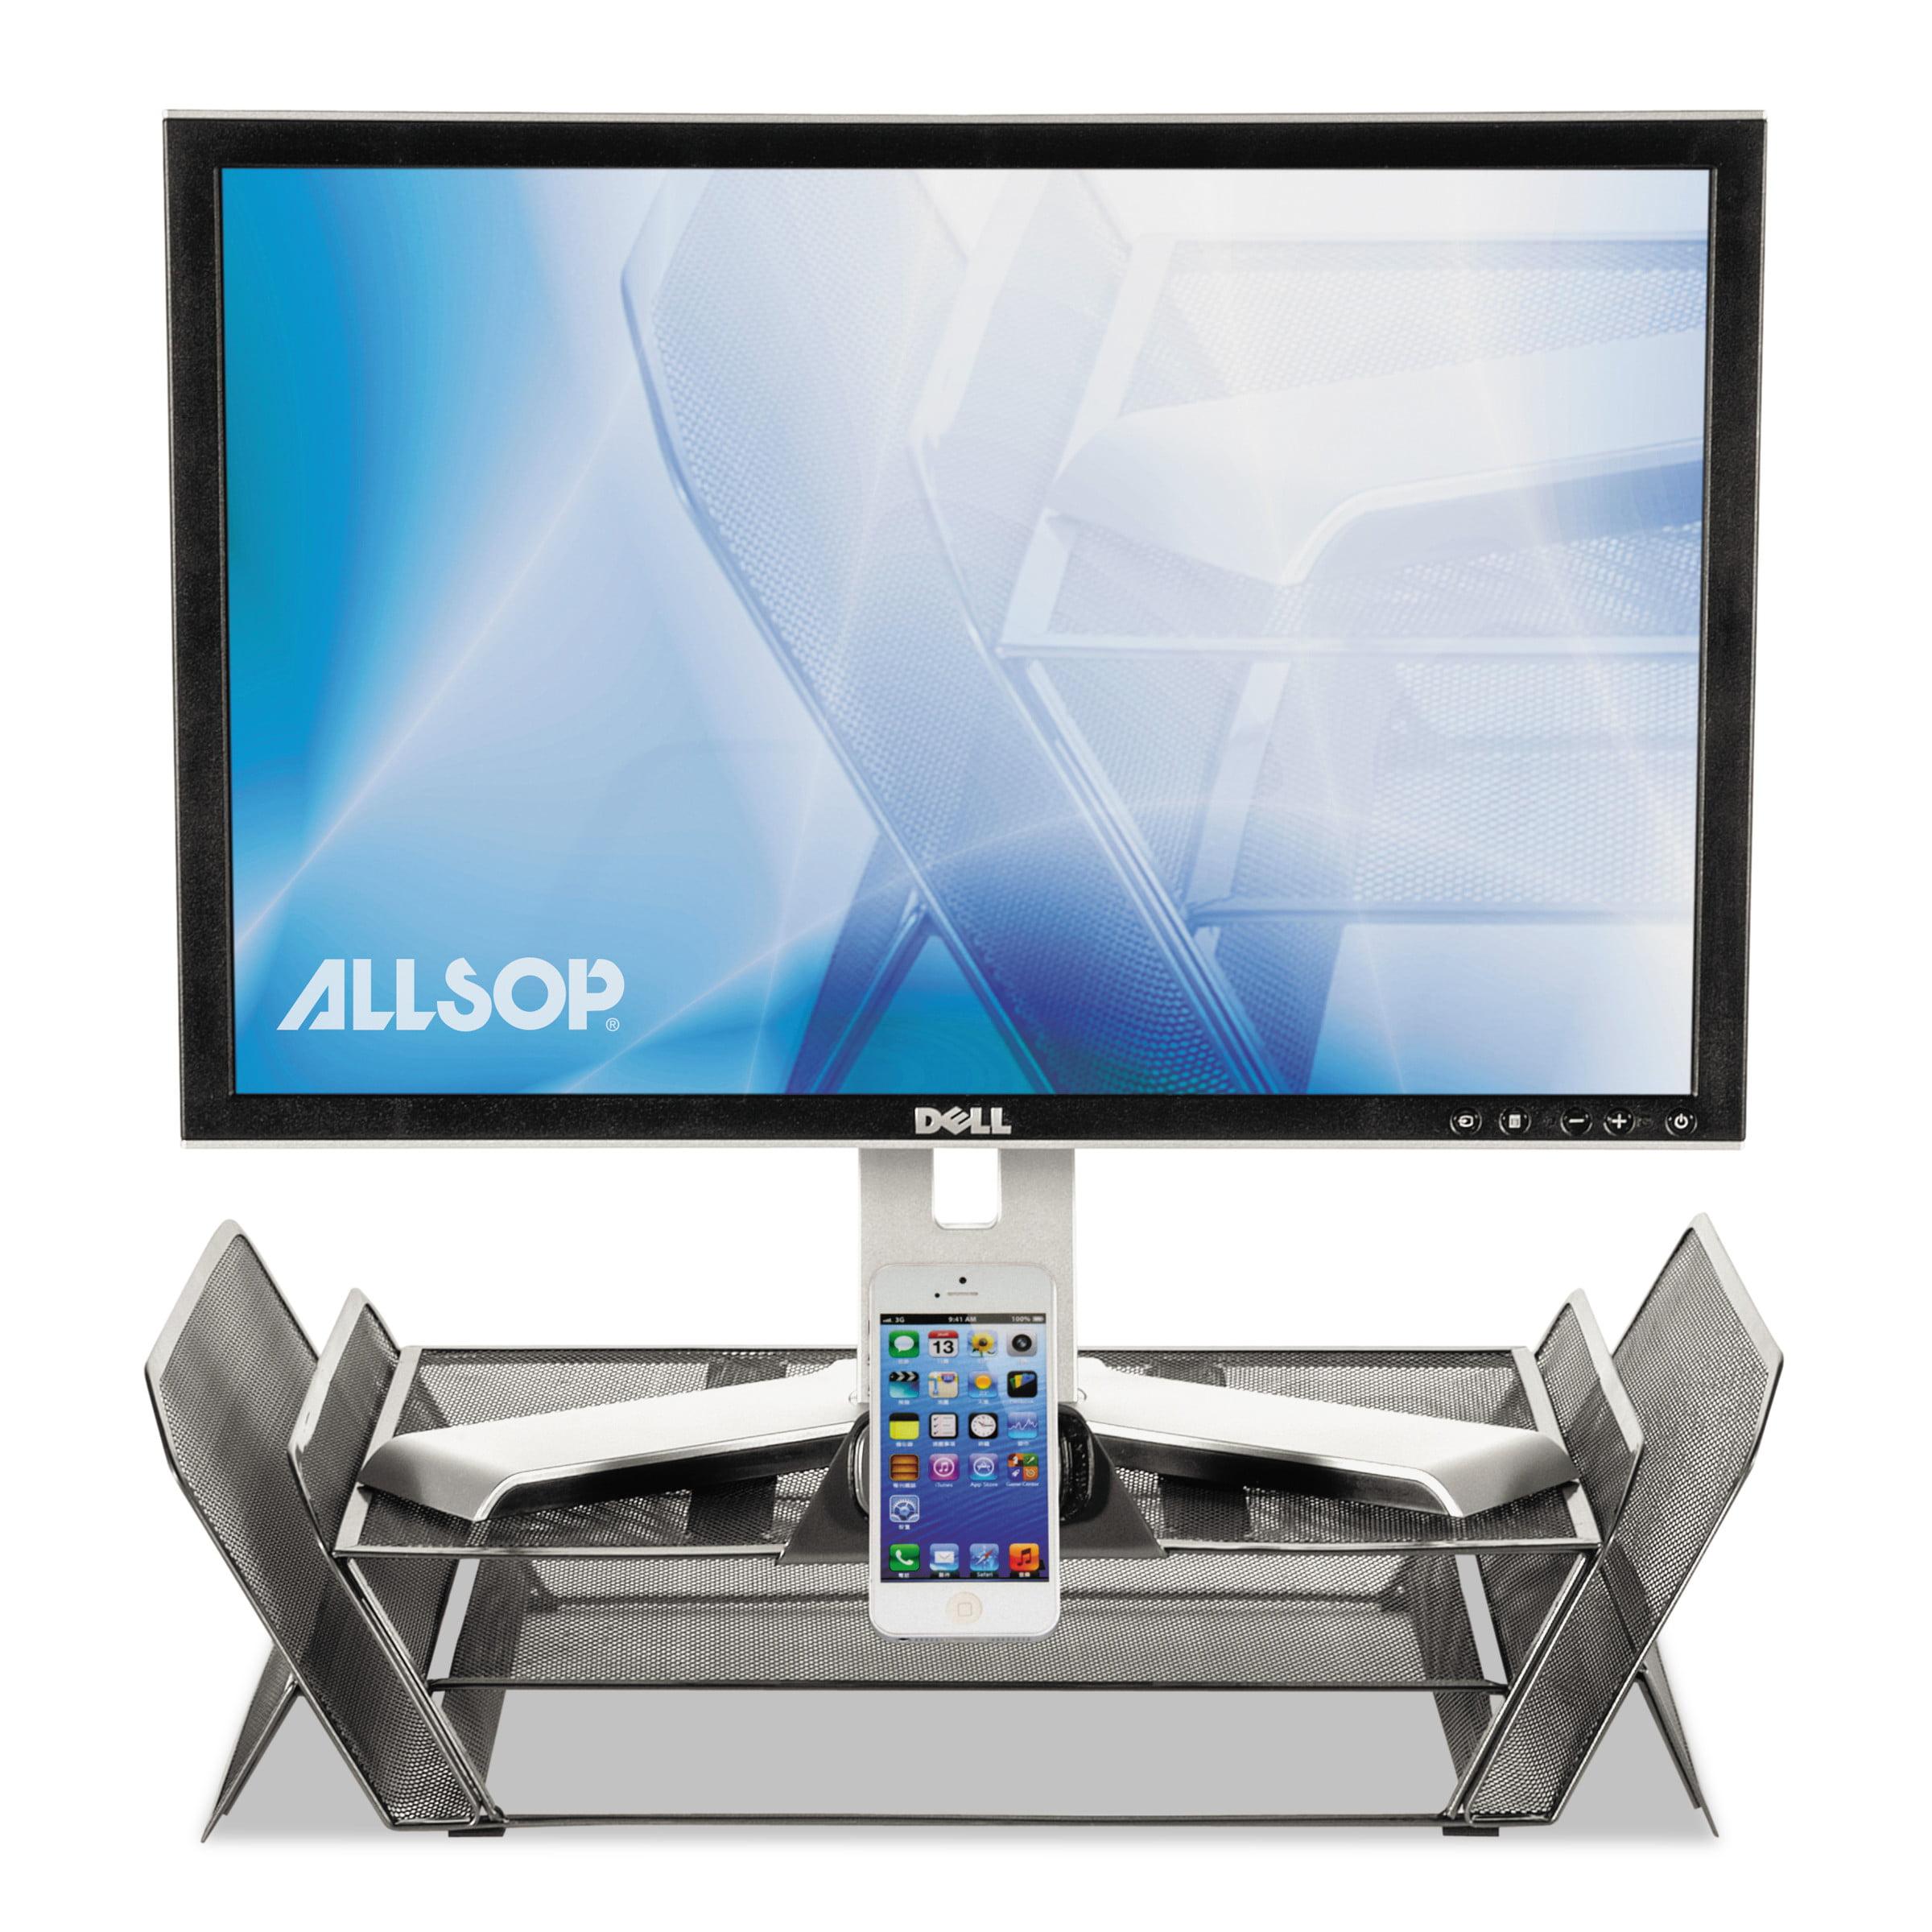 Allsop DeskTek Monitor Stand by Allsop